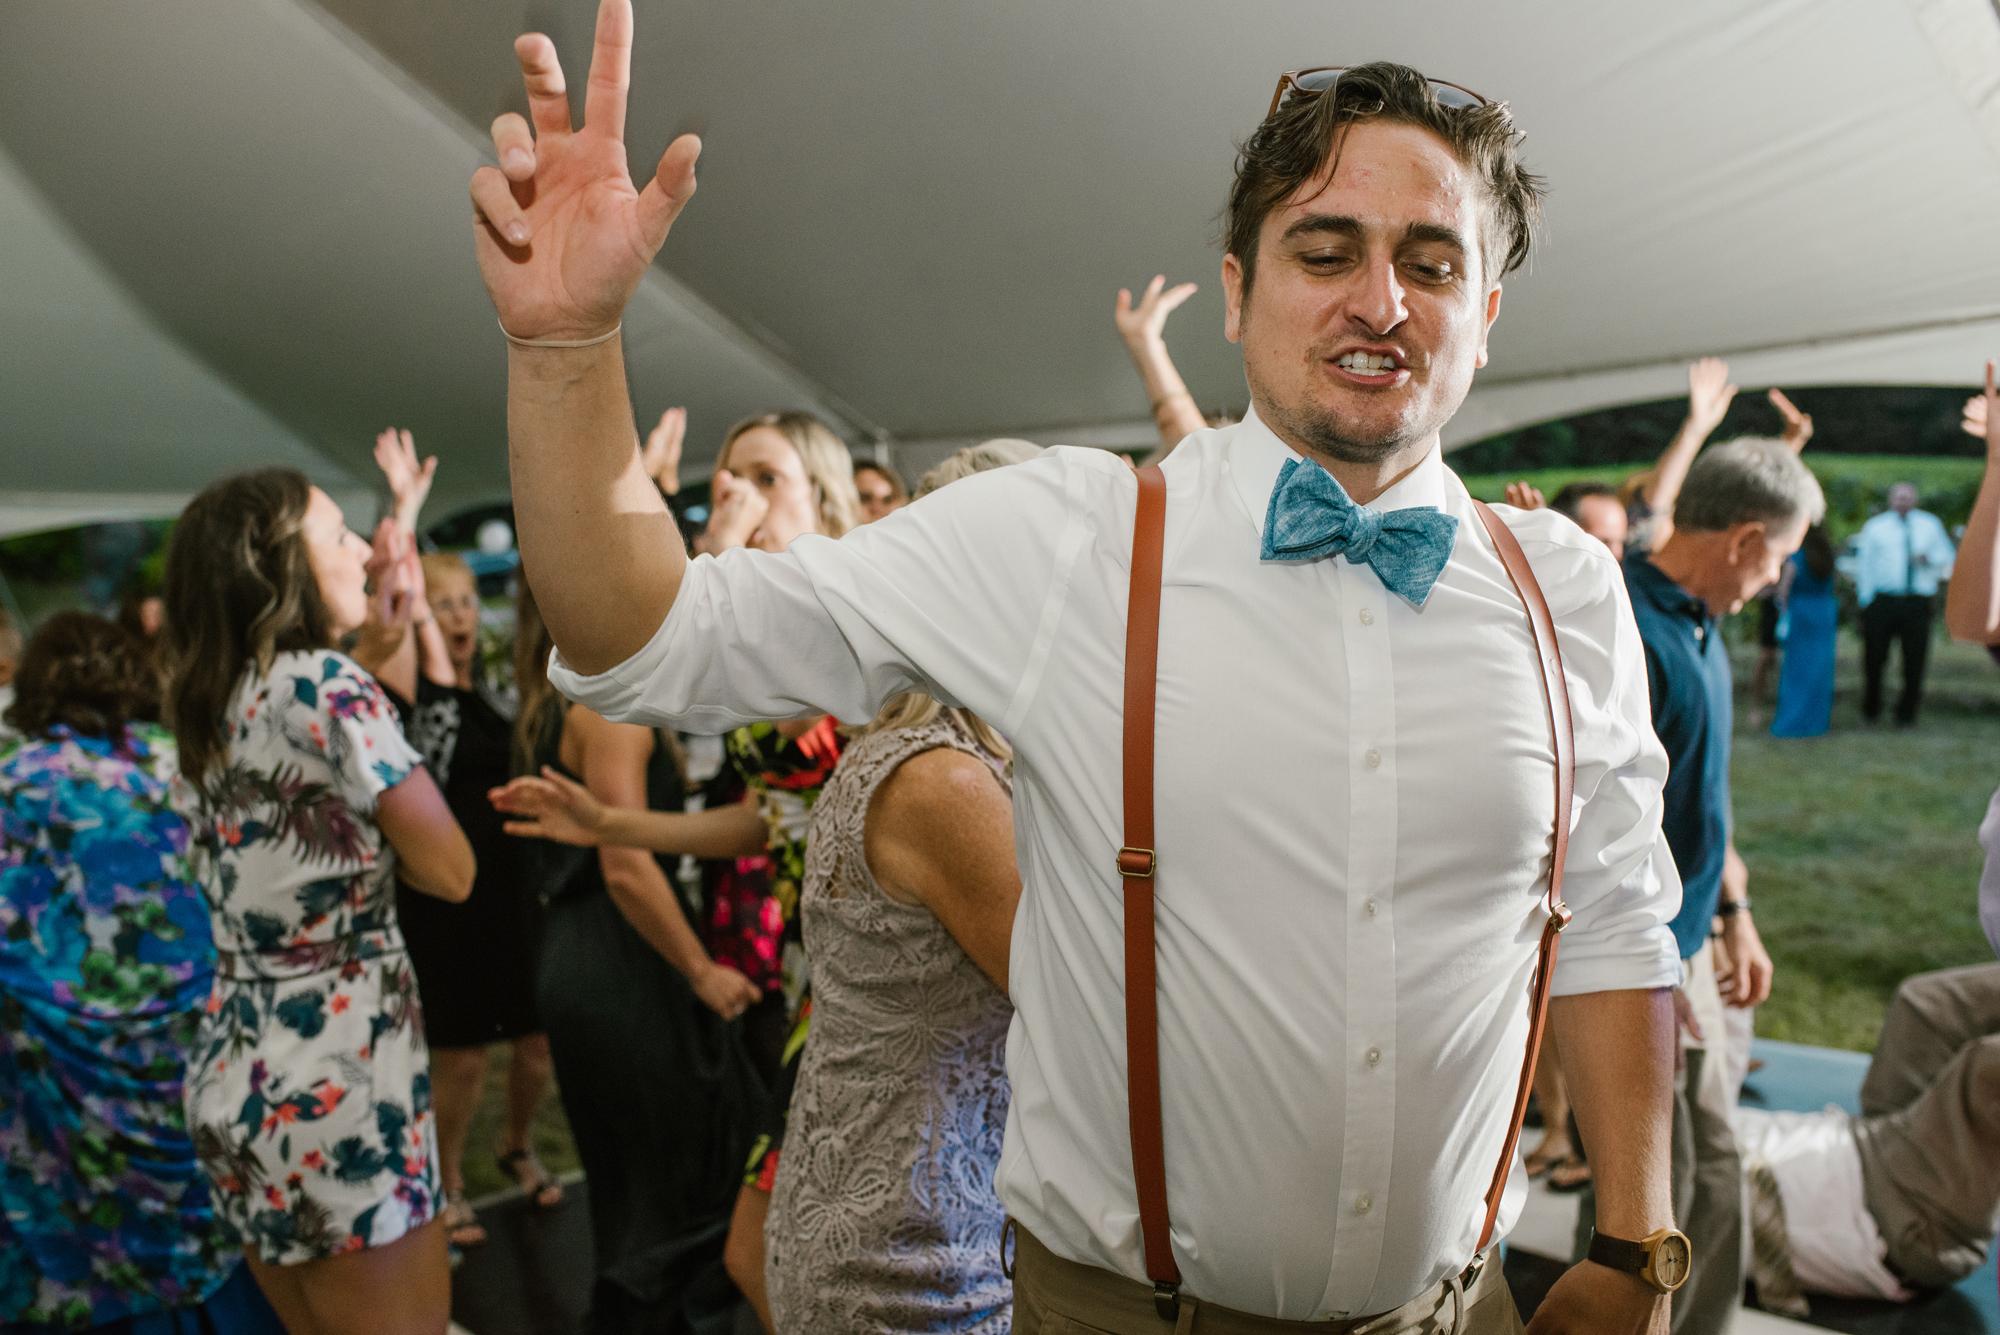 Quincy-Coldwater-Michigan-farm-wedding-photogapher-sydney-marie (517).jpg